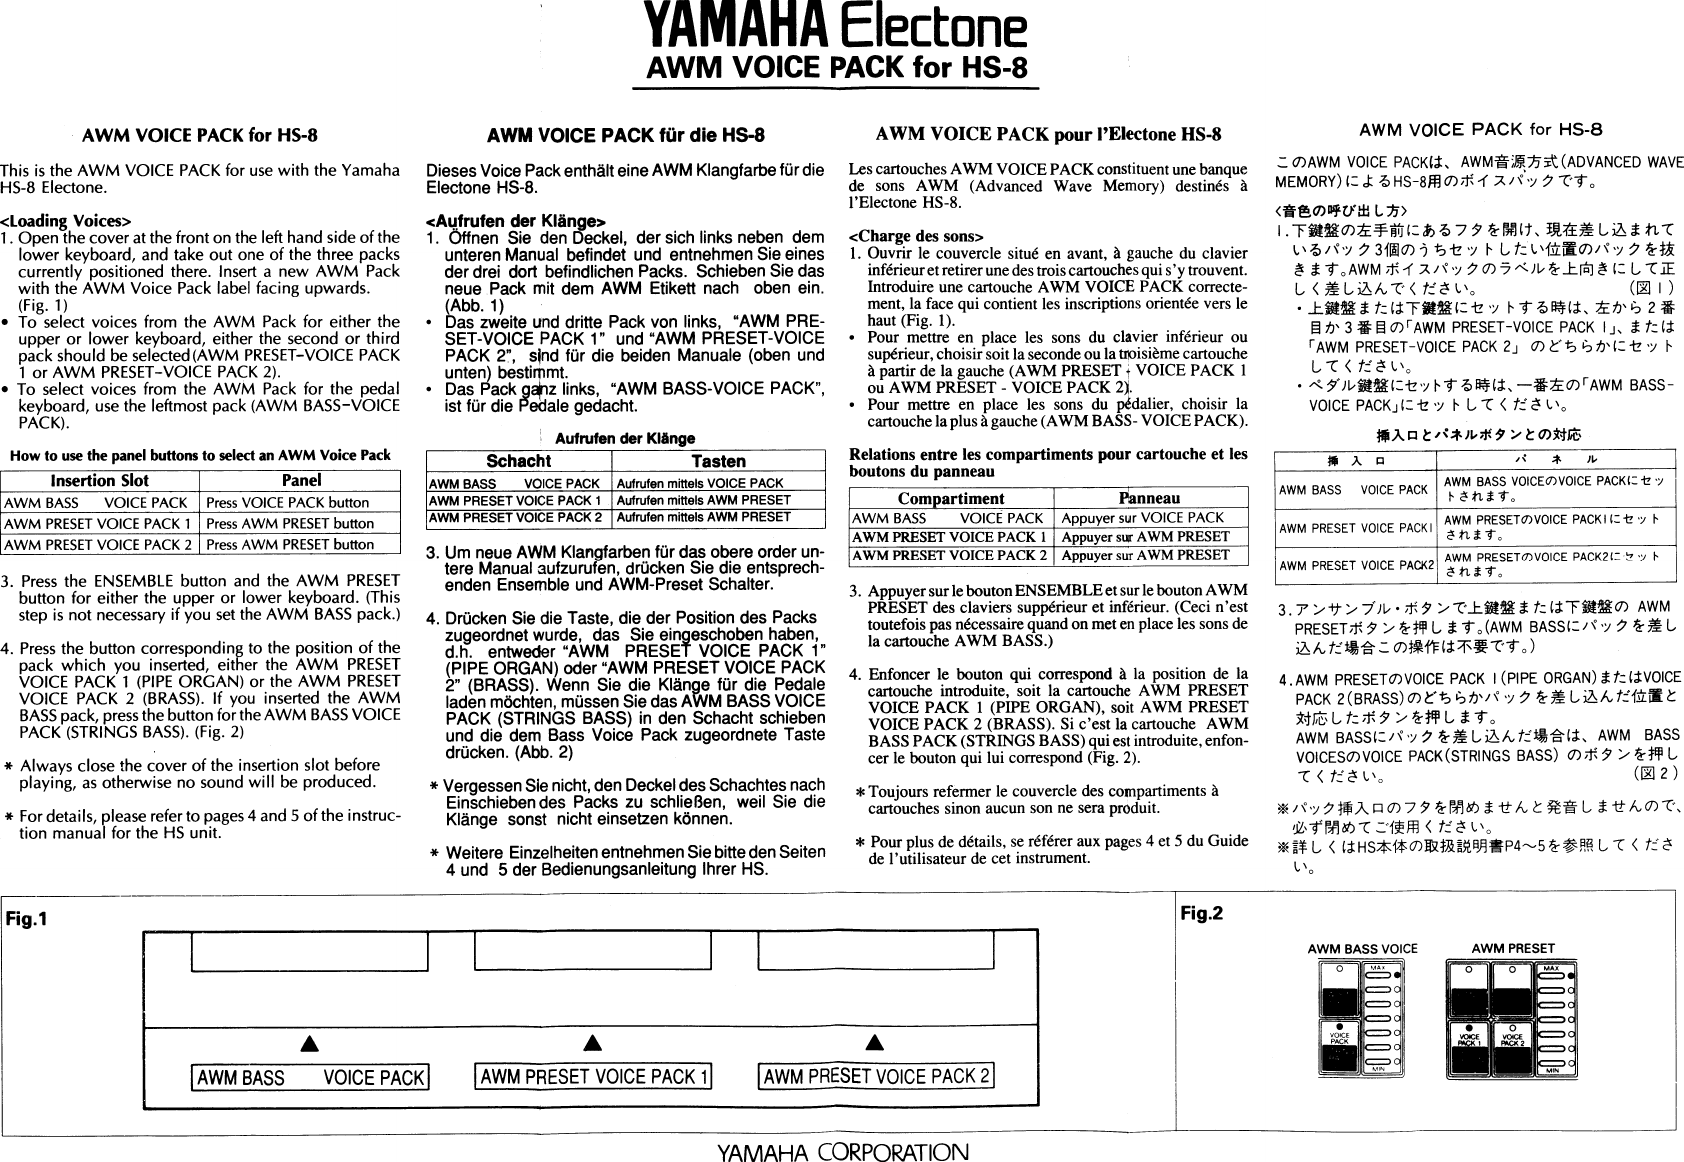 Yamaha AVP 006 (RHYTHM VOICE PACK For HS 8) Owner's Manual AVP006E